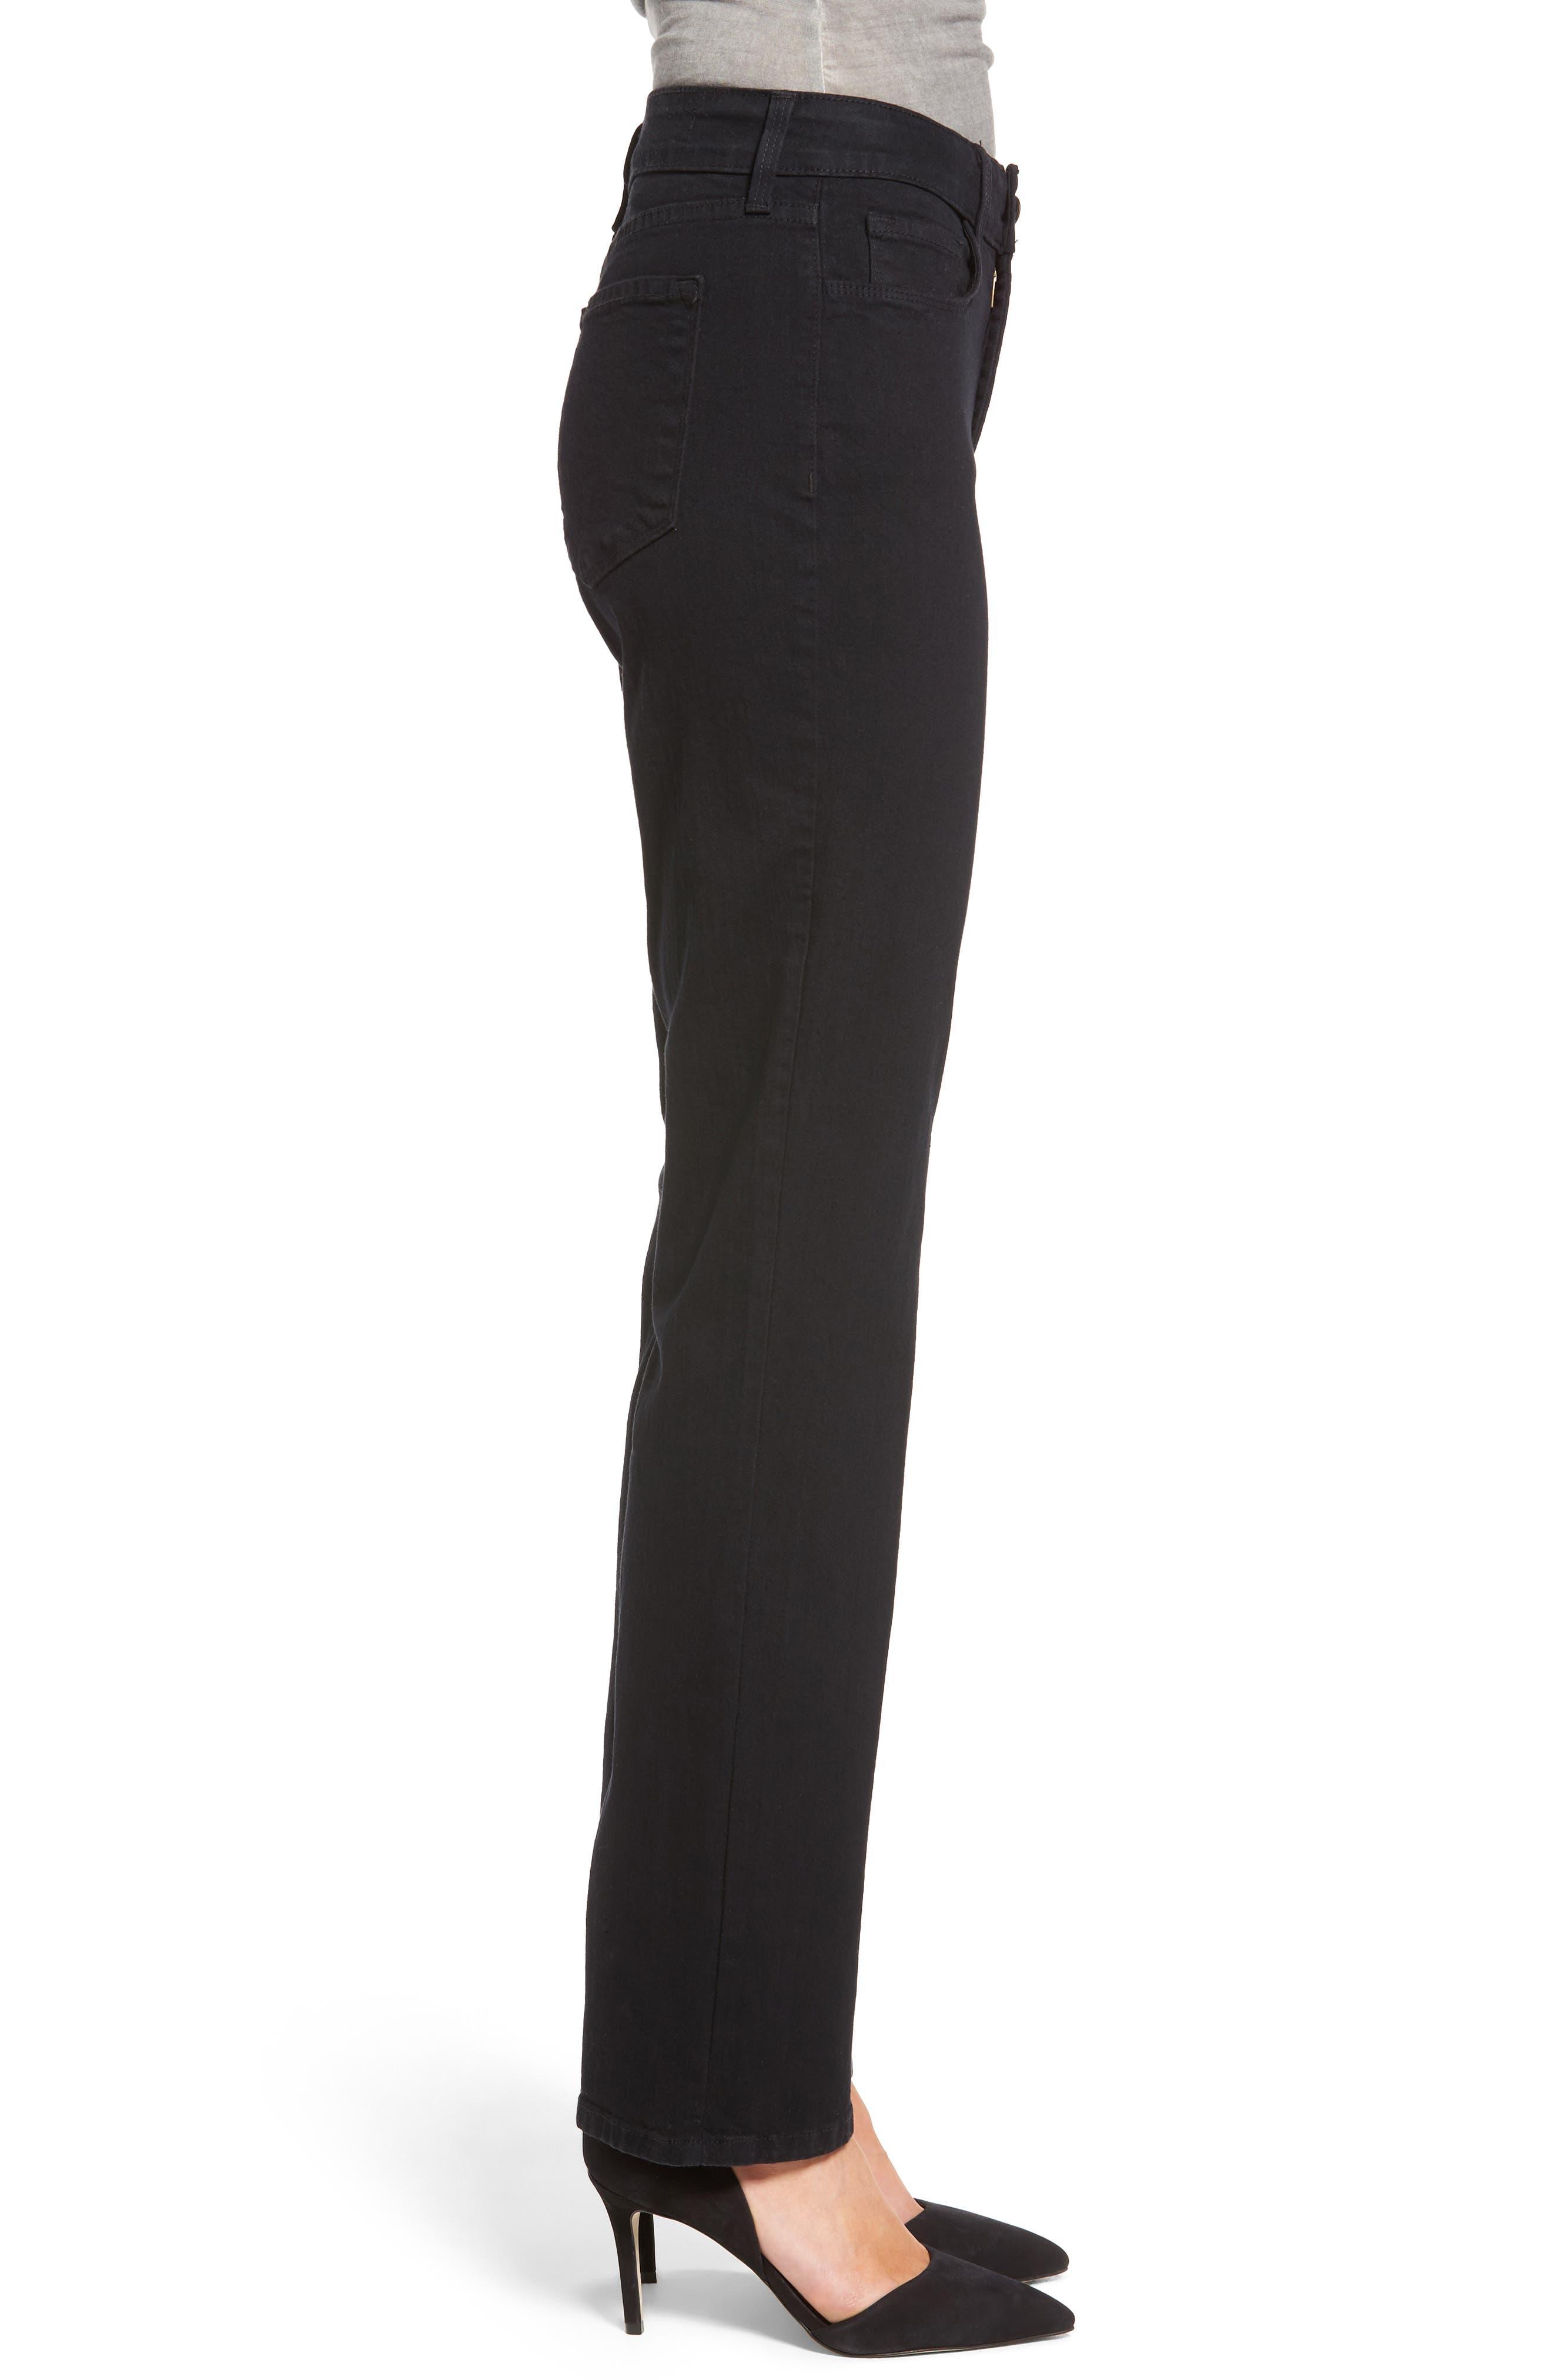 NYDJ,                             Marilyn High Waist Stretch Straight Leg Jeans,                             Alternate thumbnail 3, color,                             BLACK